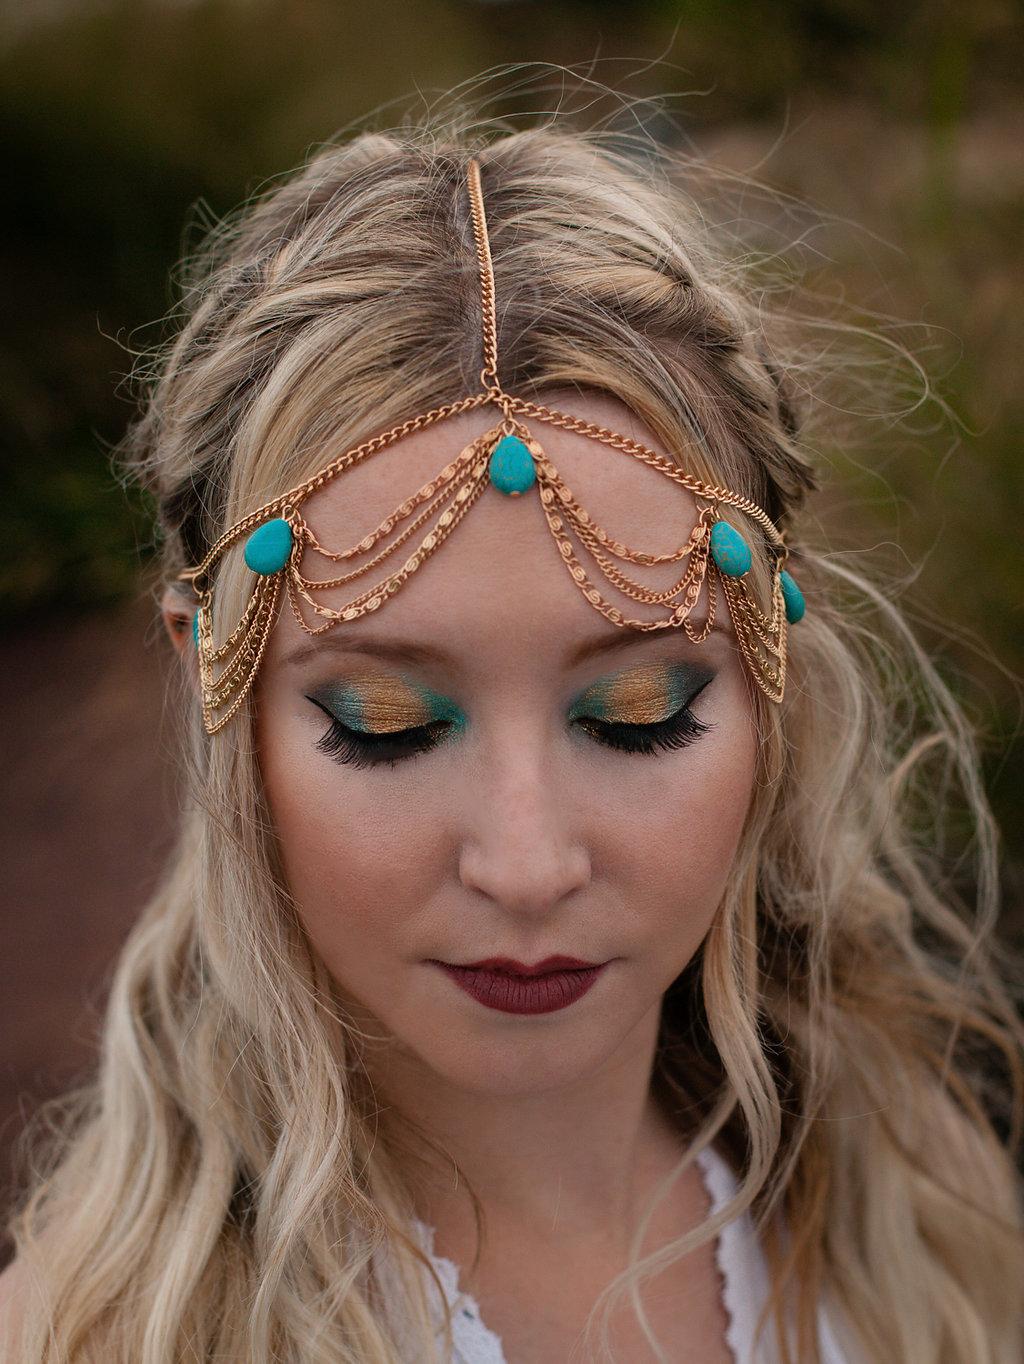 Make-Up and Hair for Bohemian Shoot